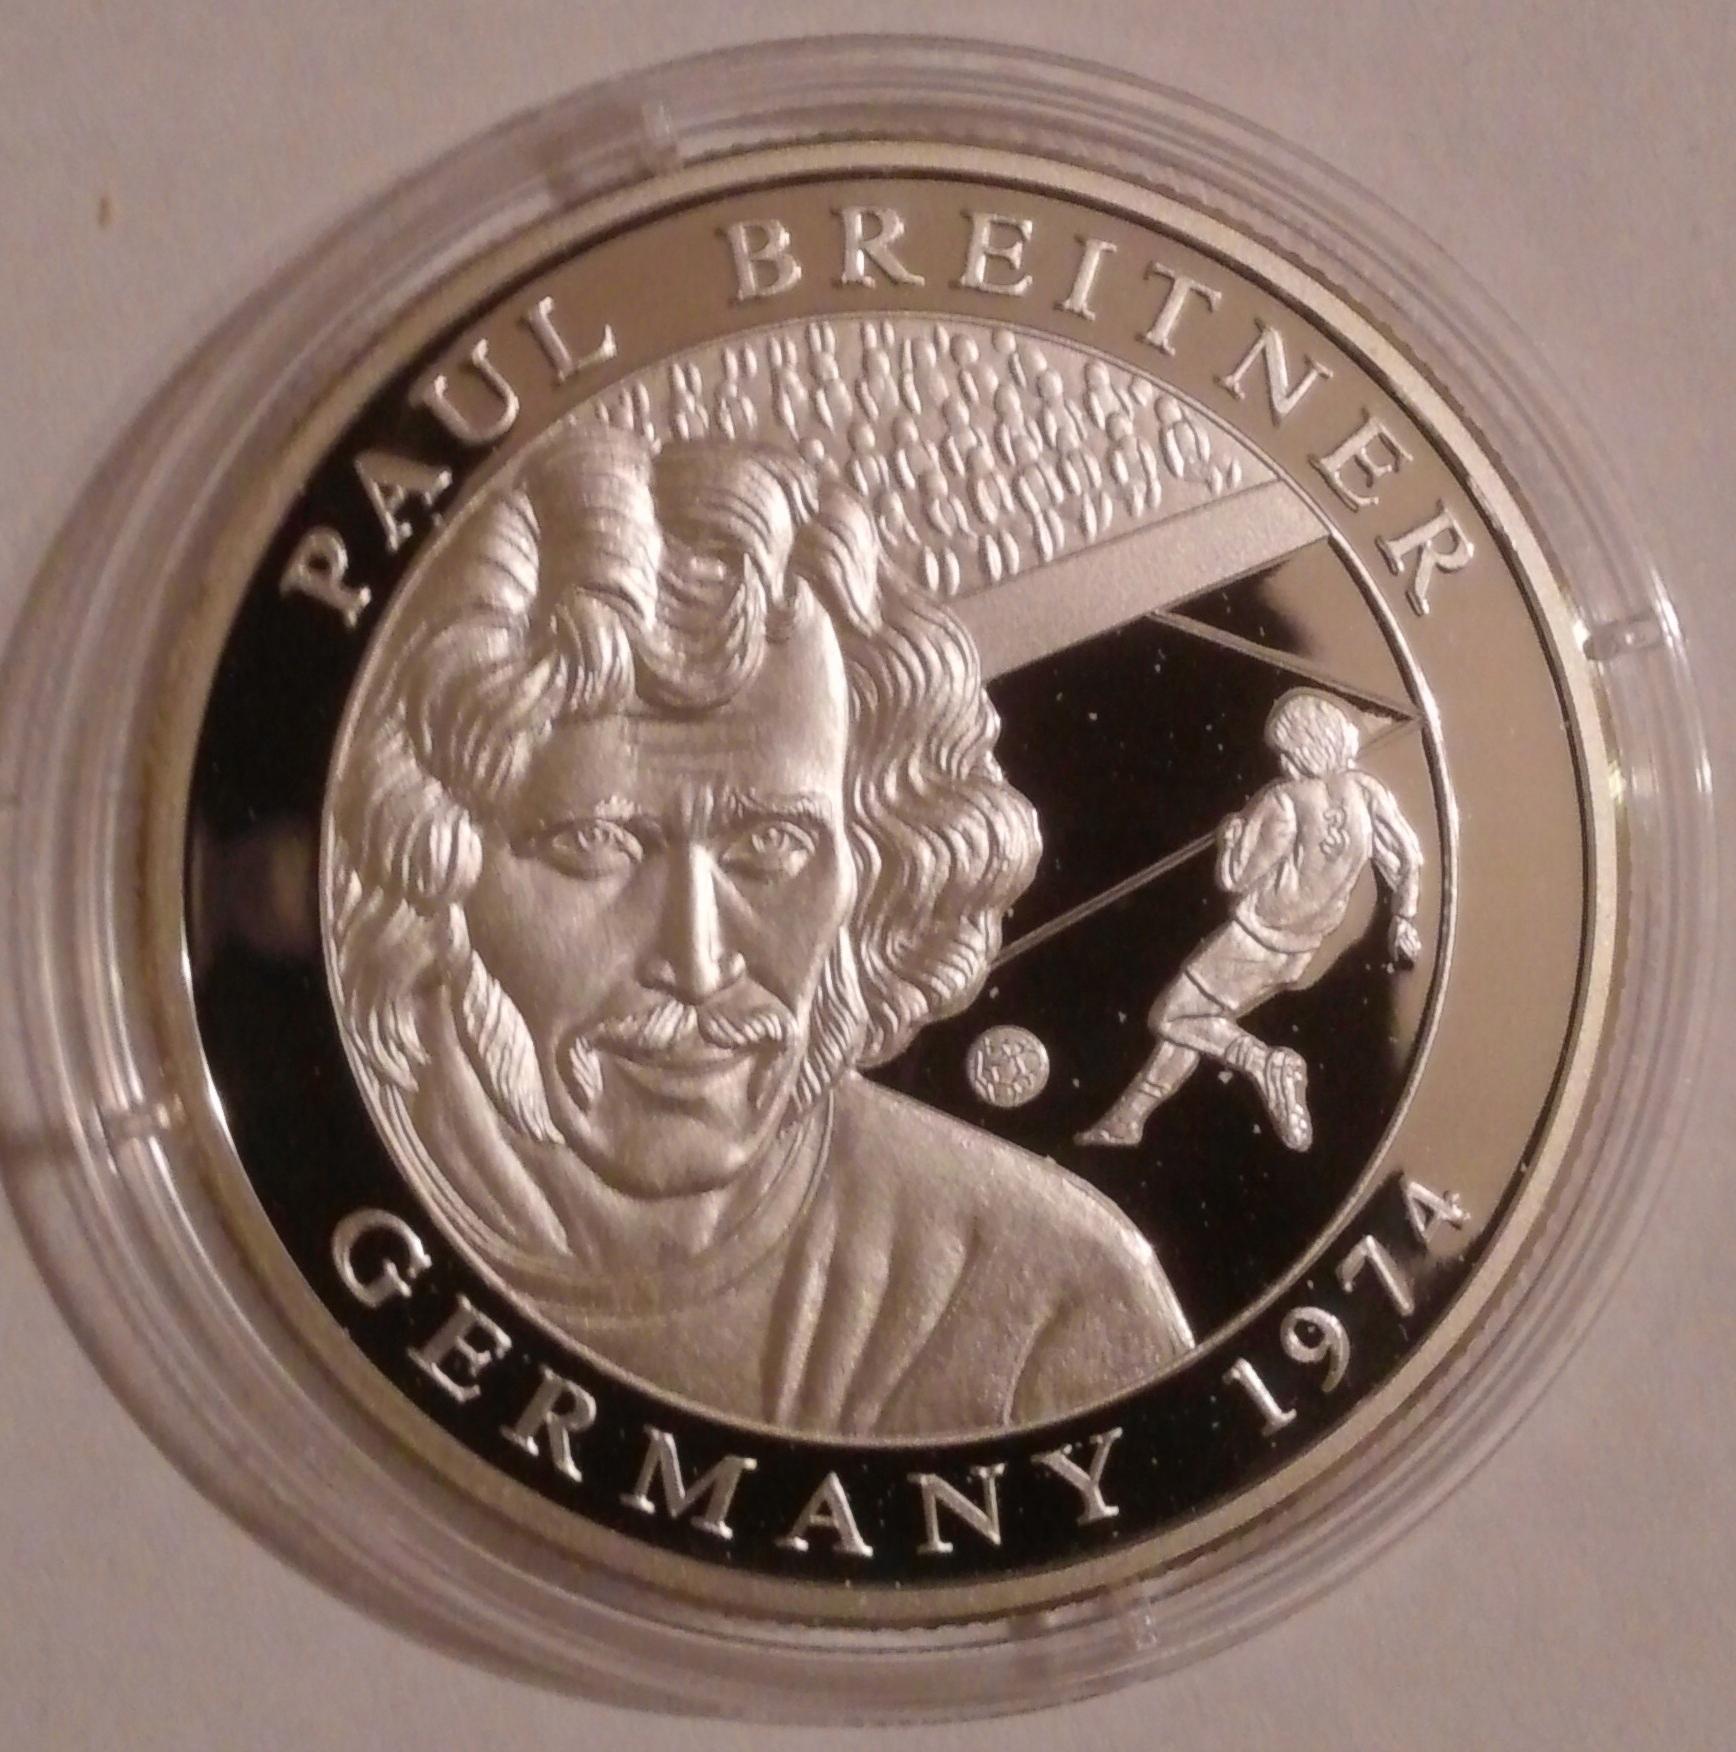 10 Dollars Liberia 2001 - Germany 1974 ; srebro